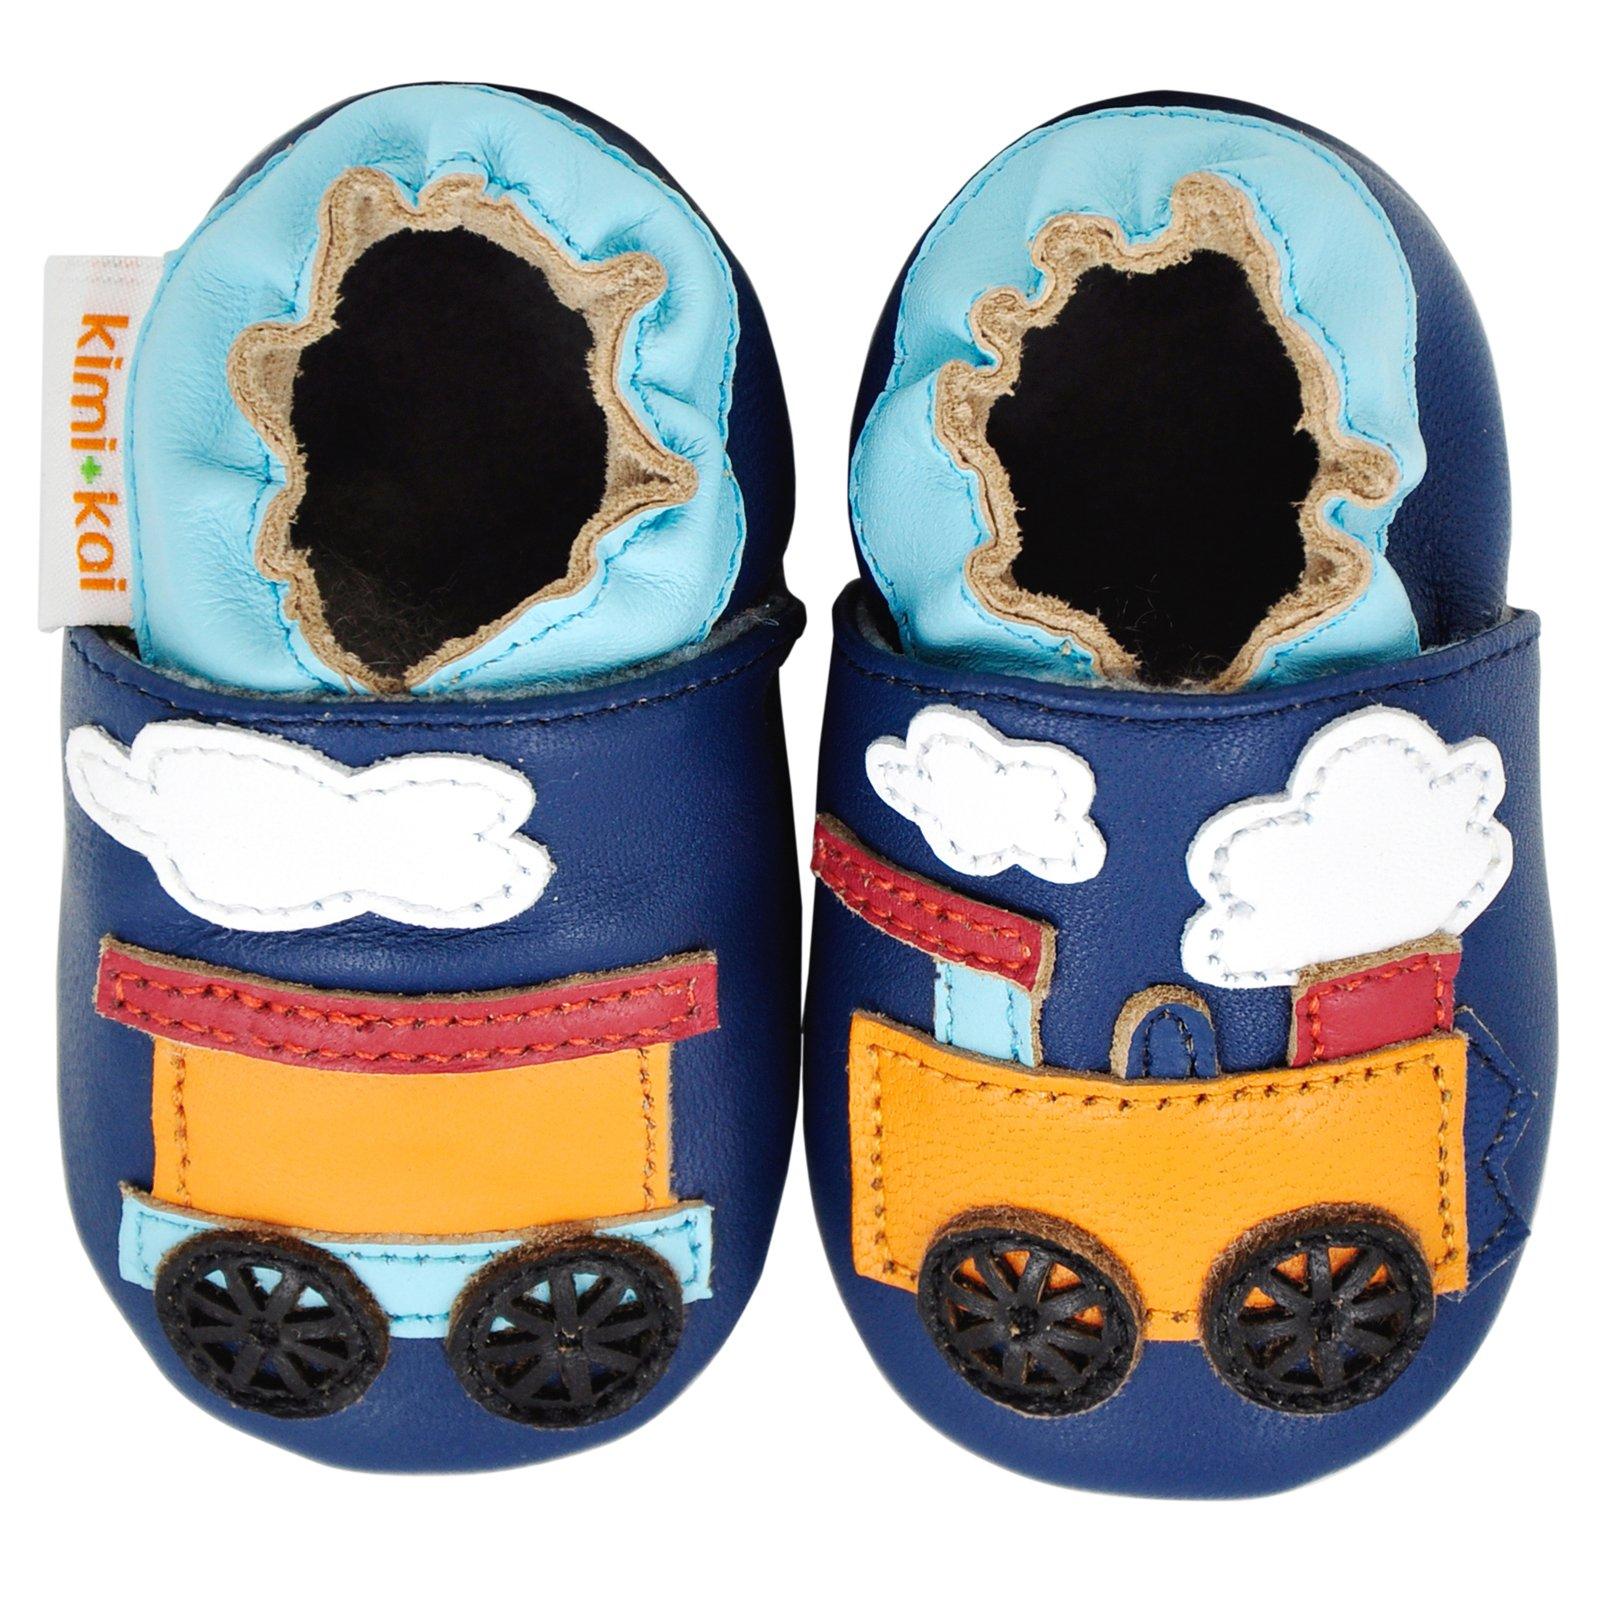 Kimi + Kai Baby Boys Lambskin Leather Soft Sole Shoes - Train (6-12 Months) Navy by Kimi & Kai